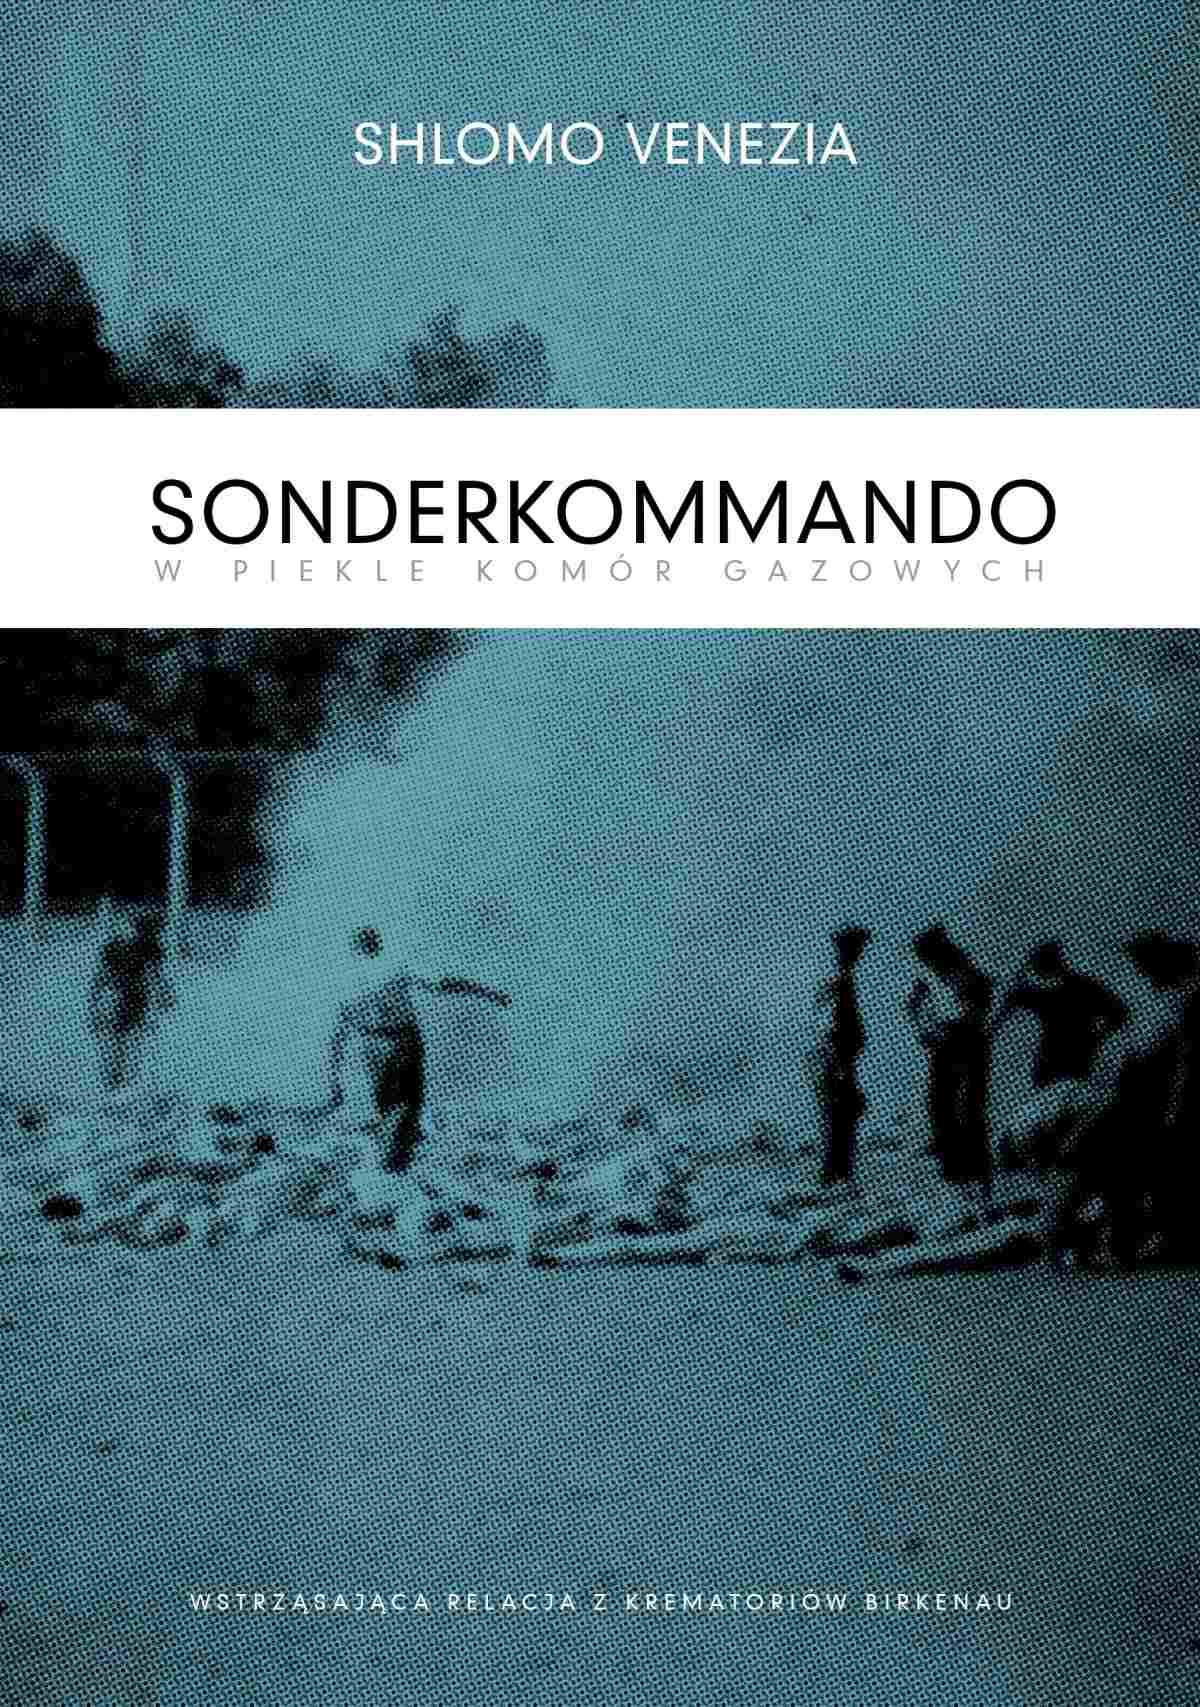 Sonderkommando - Ebook (Książka EPUB) do pobrania w formacie EPUB